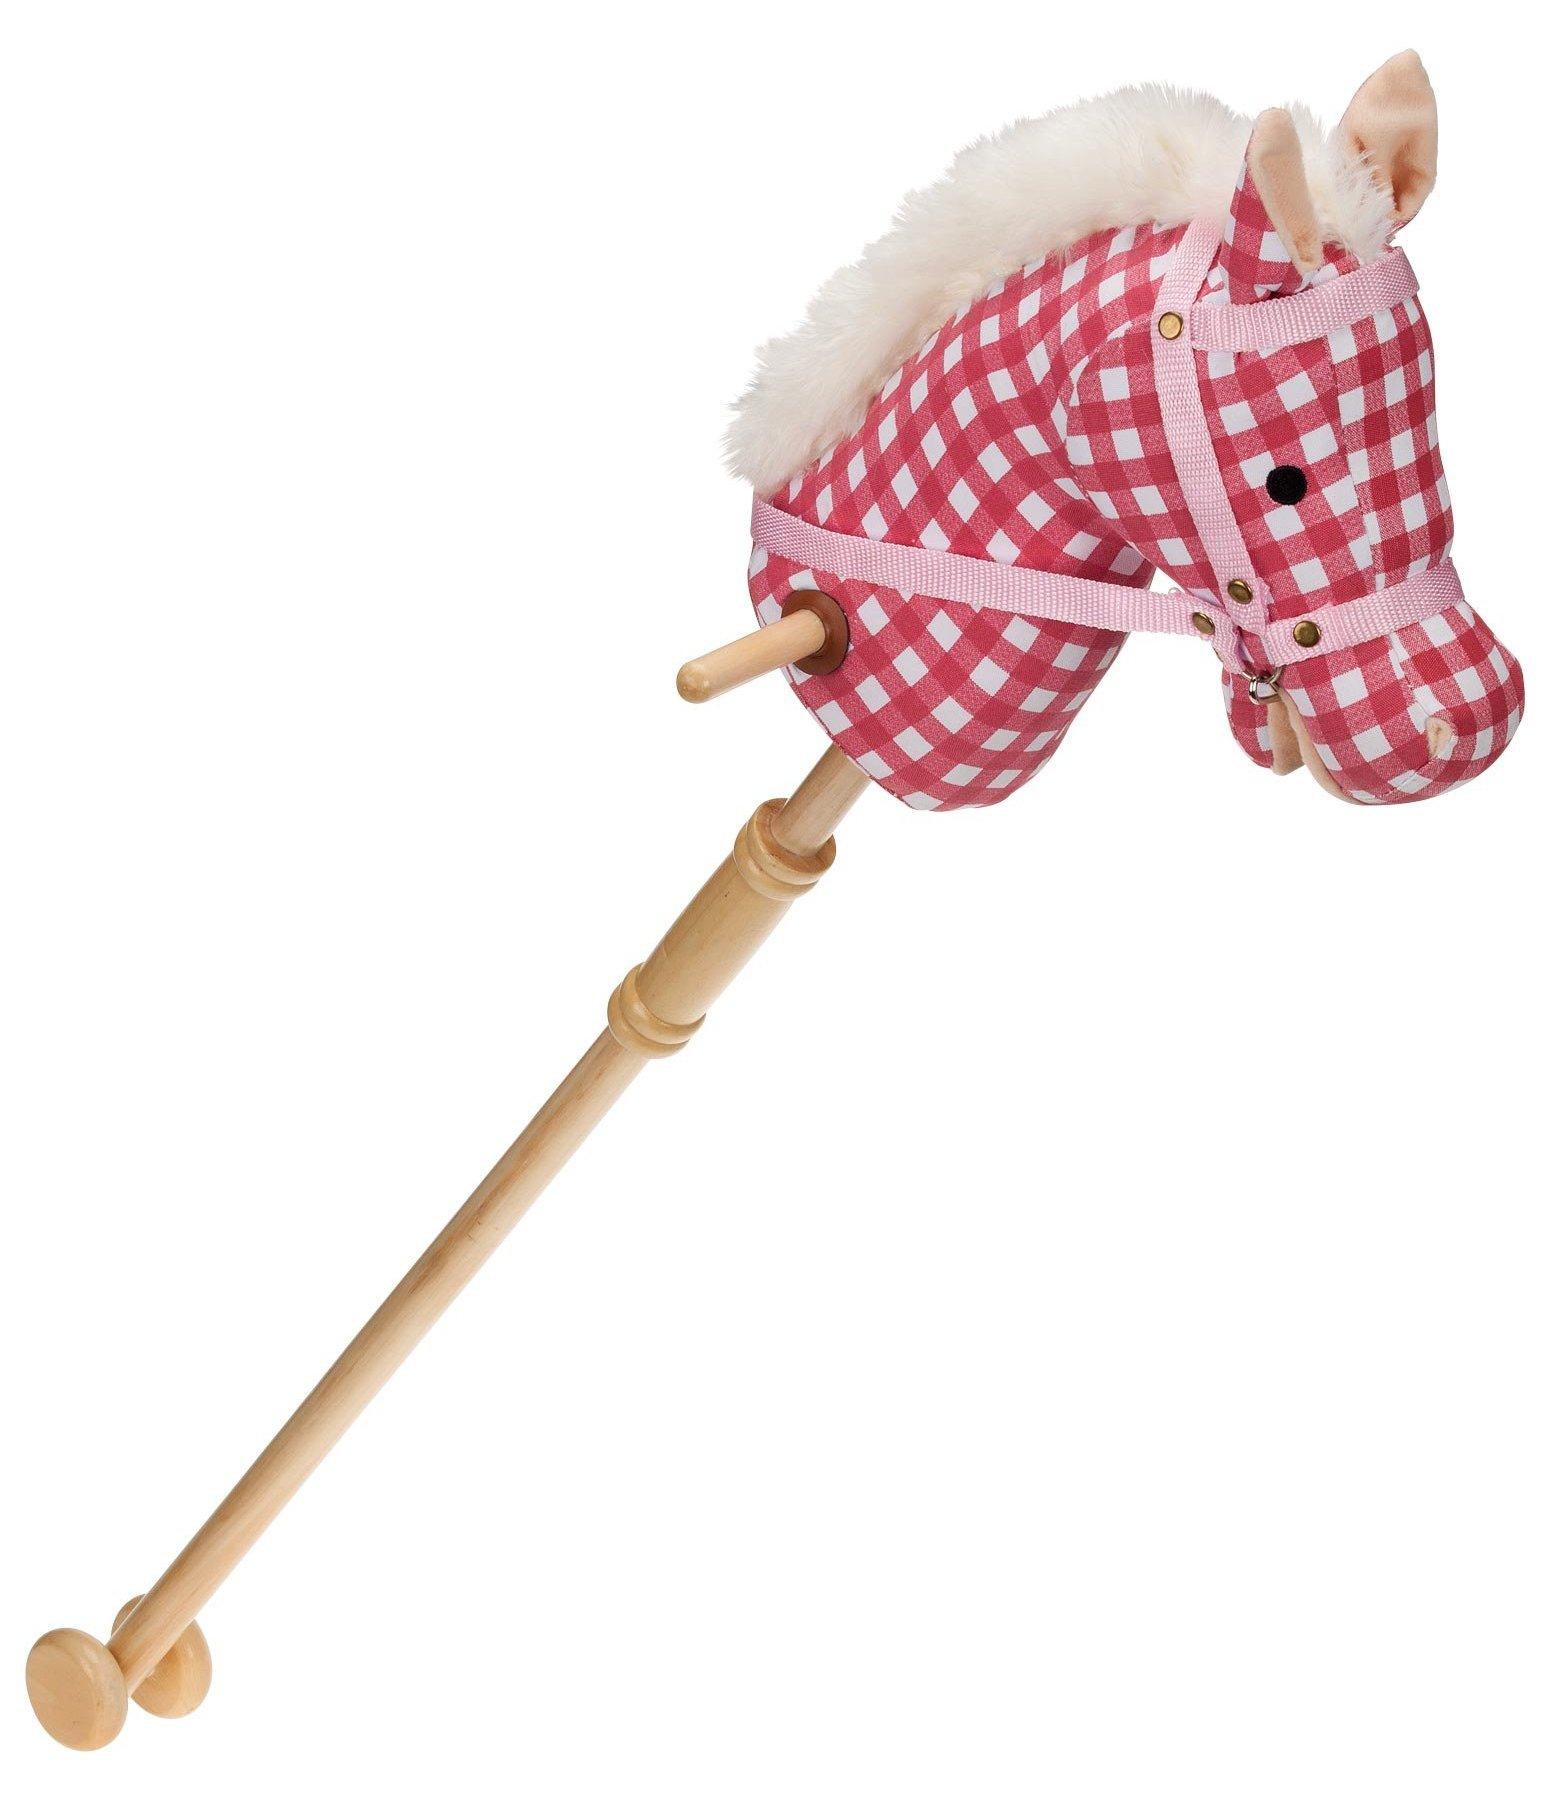 cheval baton rosalie jouets felix b hler. Black Bedroom Furniture Sets. Home Design Ideas